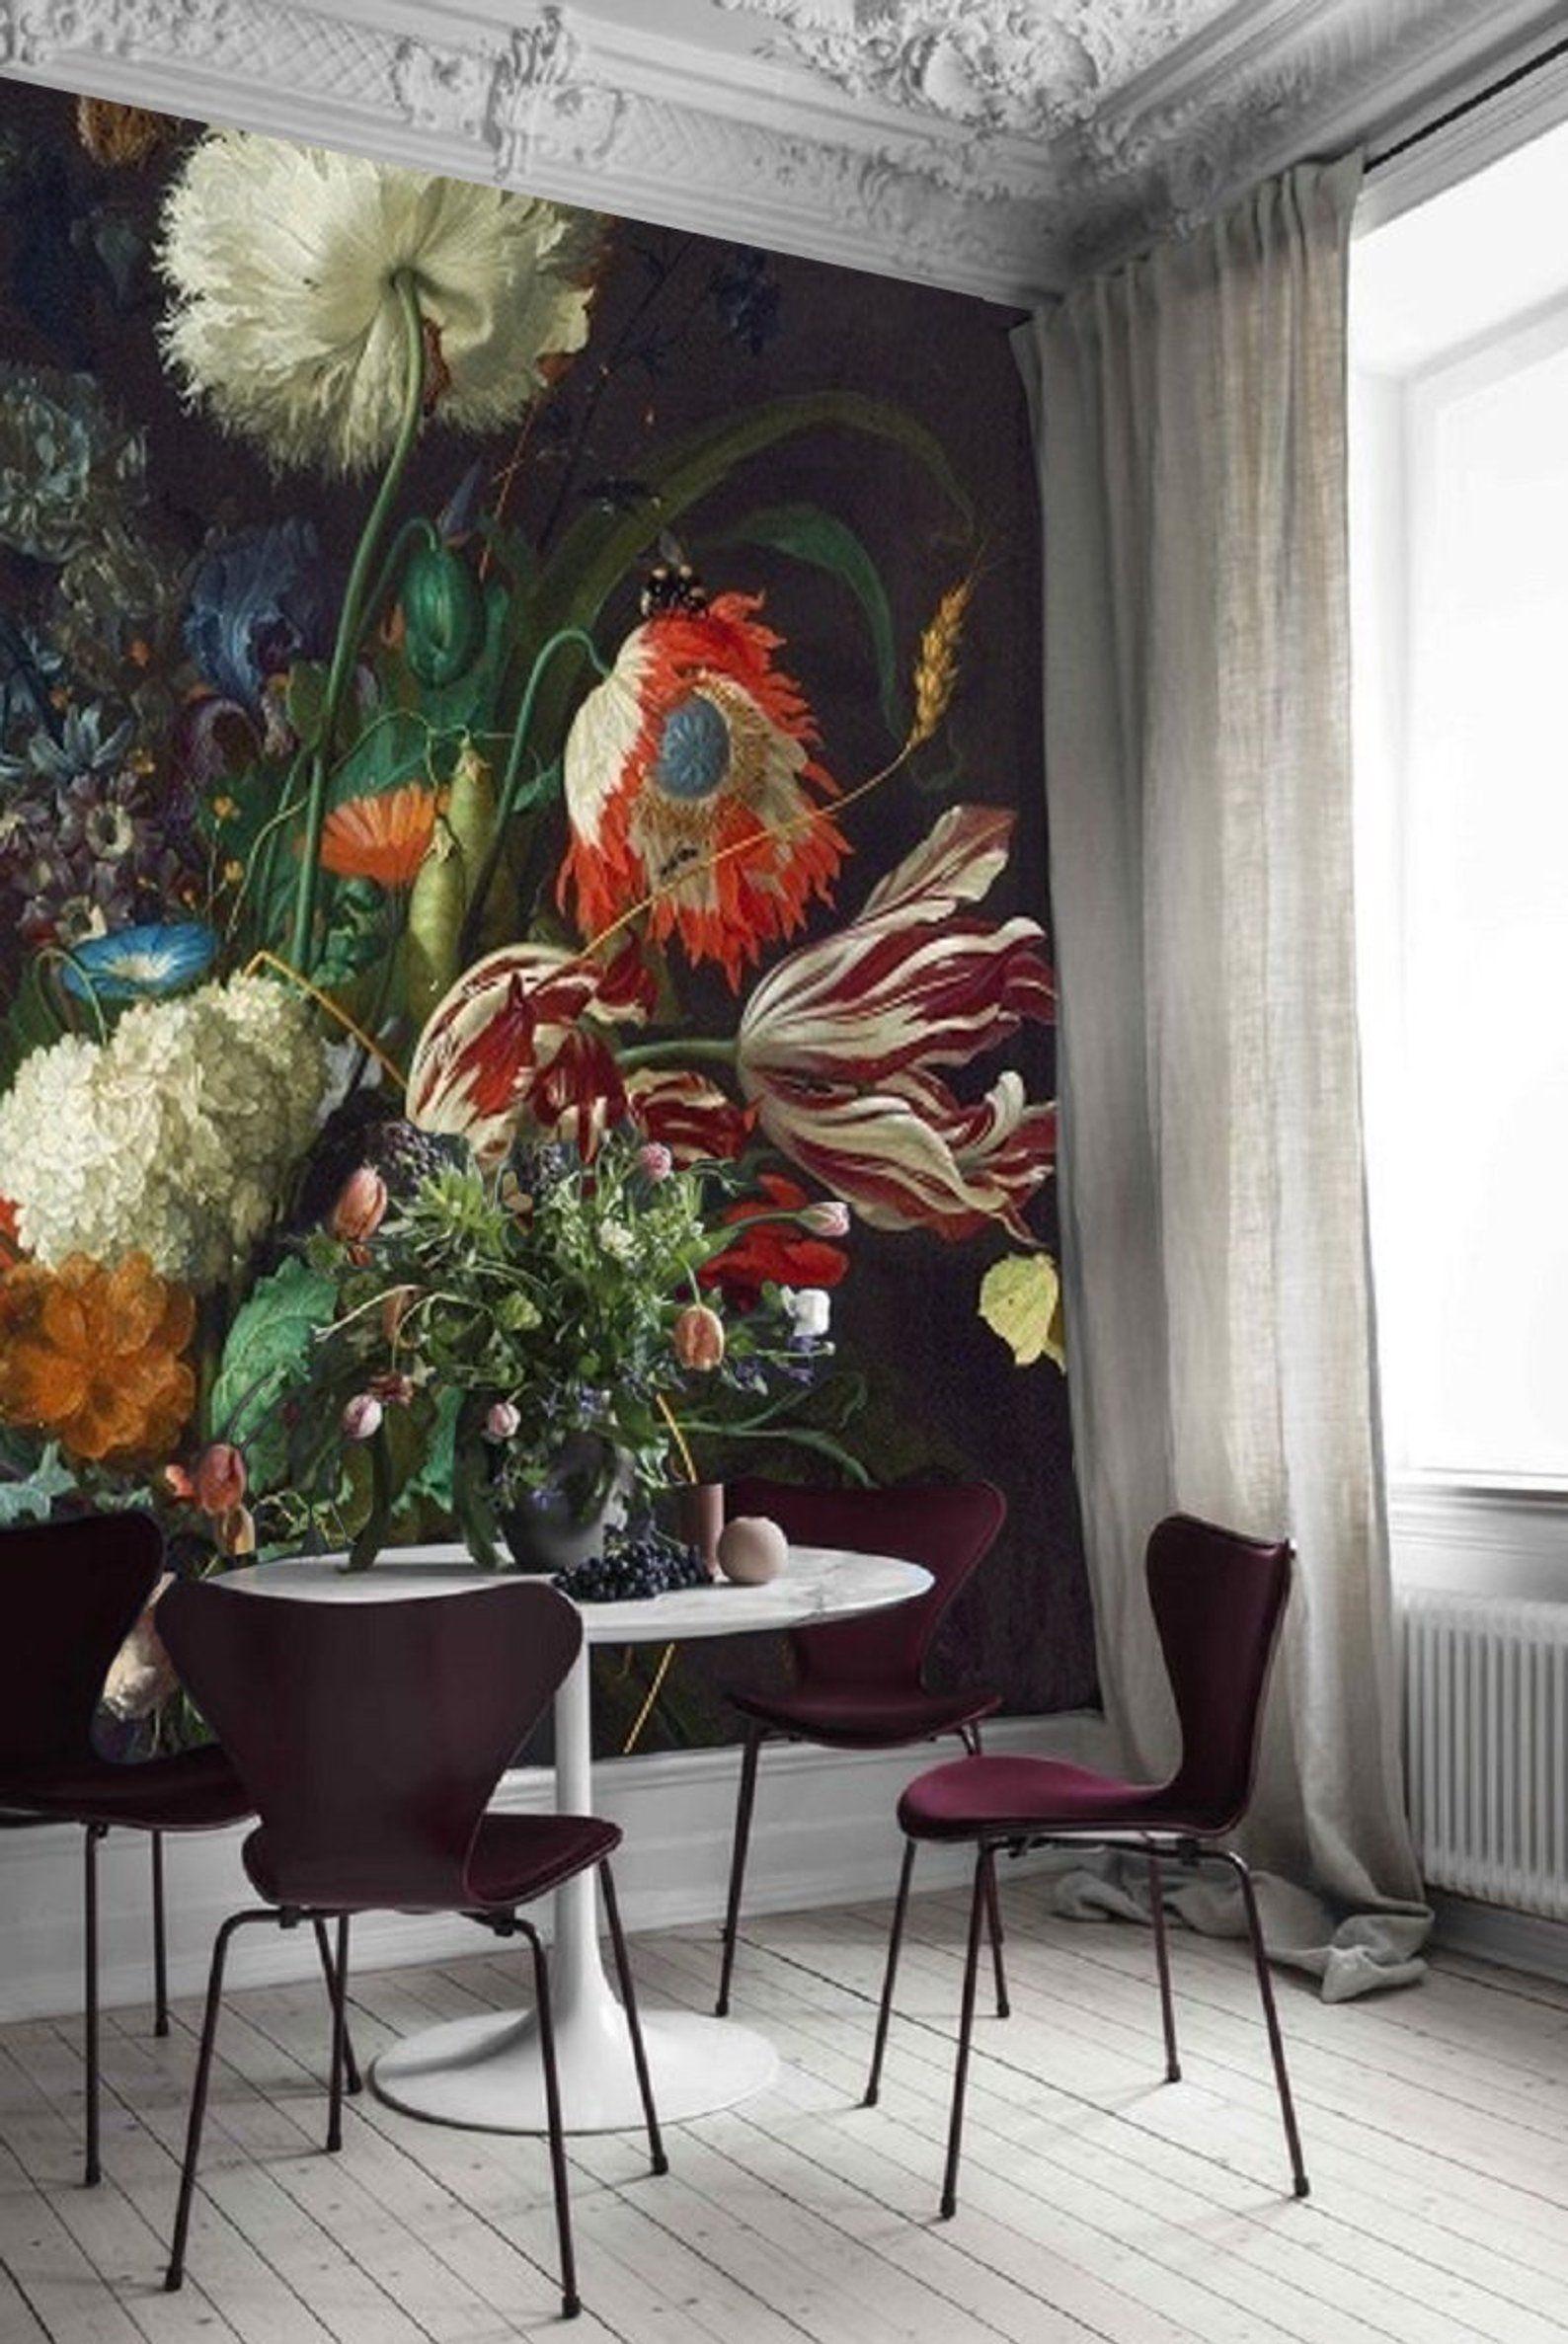 Vintage Floral Wallpaper Peel and Stick Black, Large Scale Floral Wallpaper Living Room, Self Adhesive Wall Mural, Big Flower Wallpaper #142